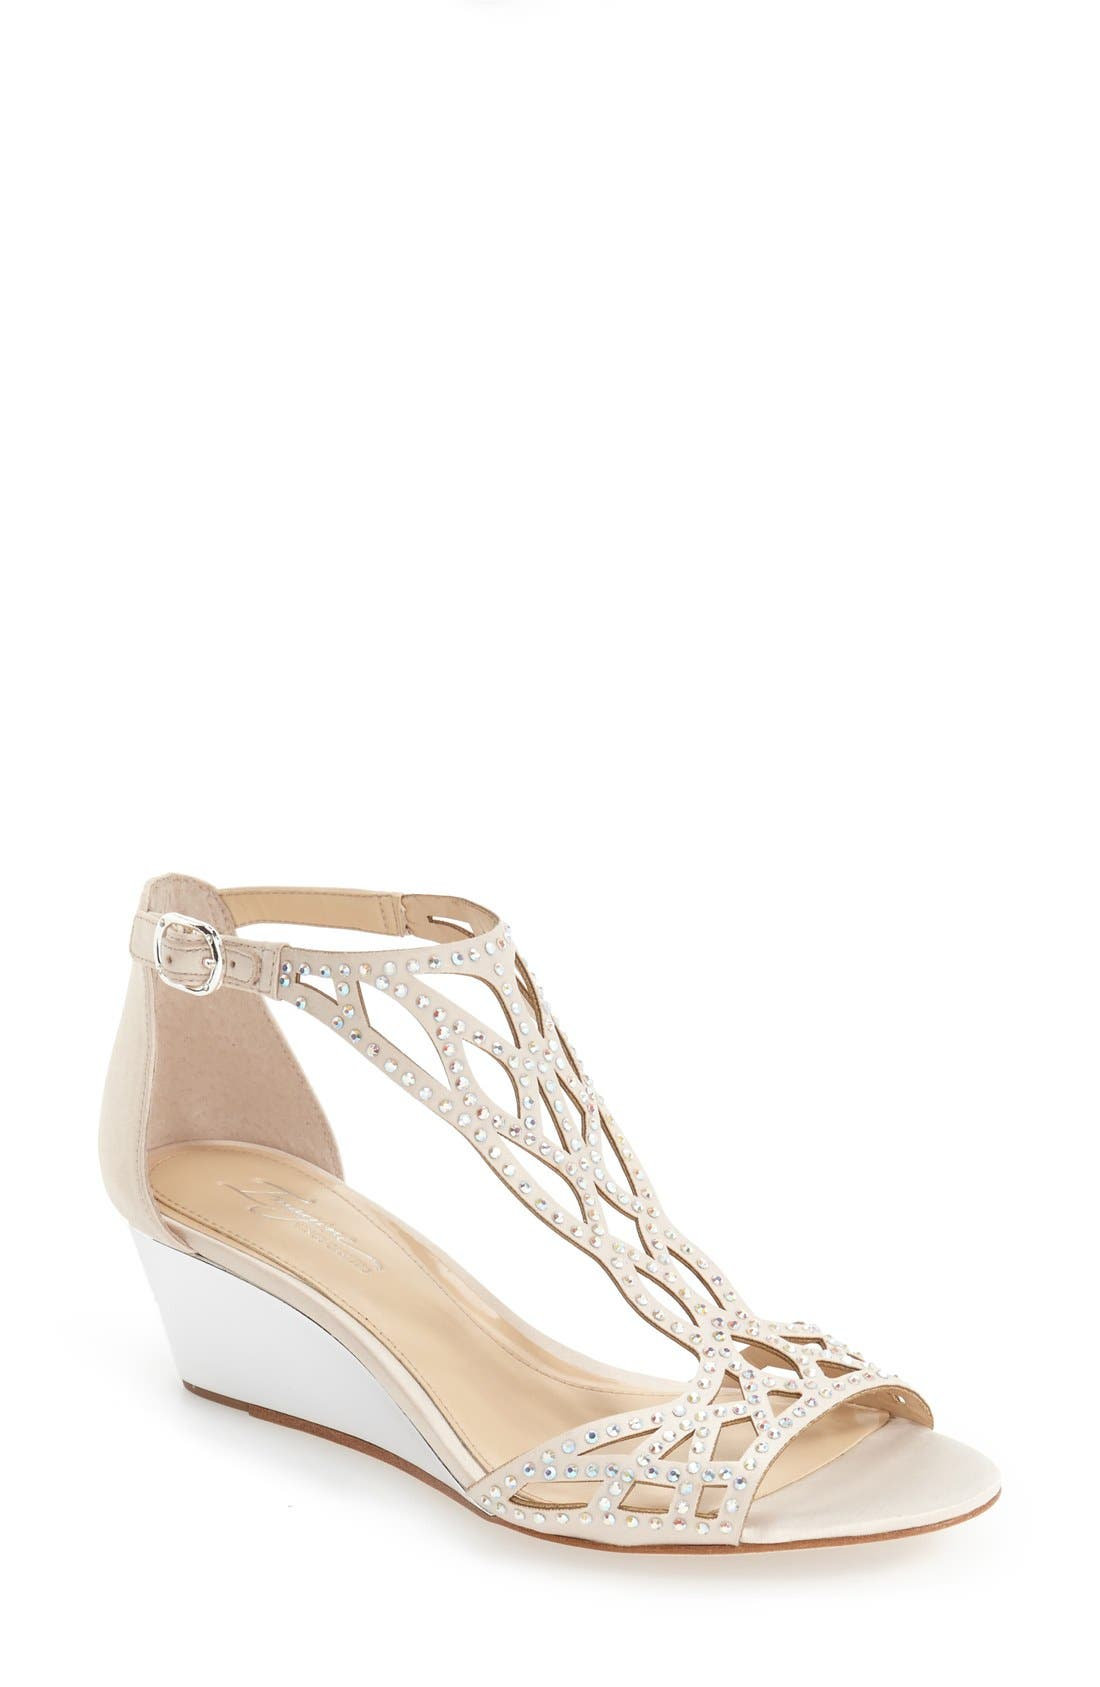 Mens Wine Wedding Shoes Lining Fabric MJ015881